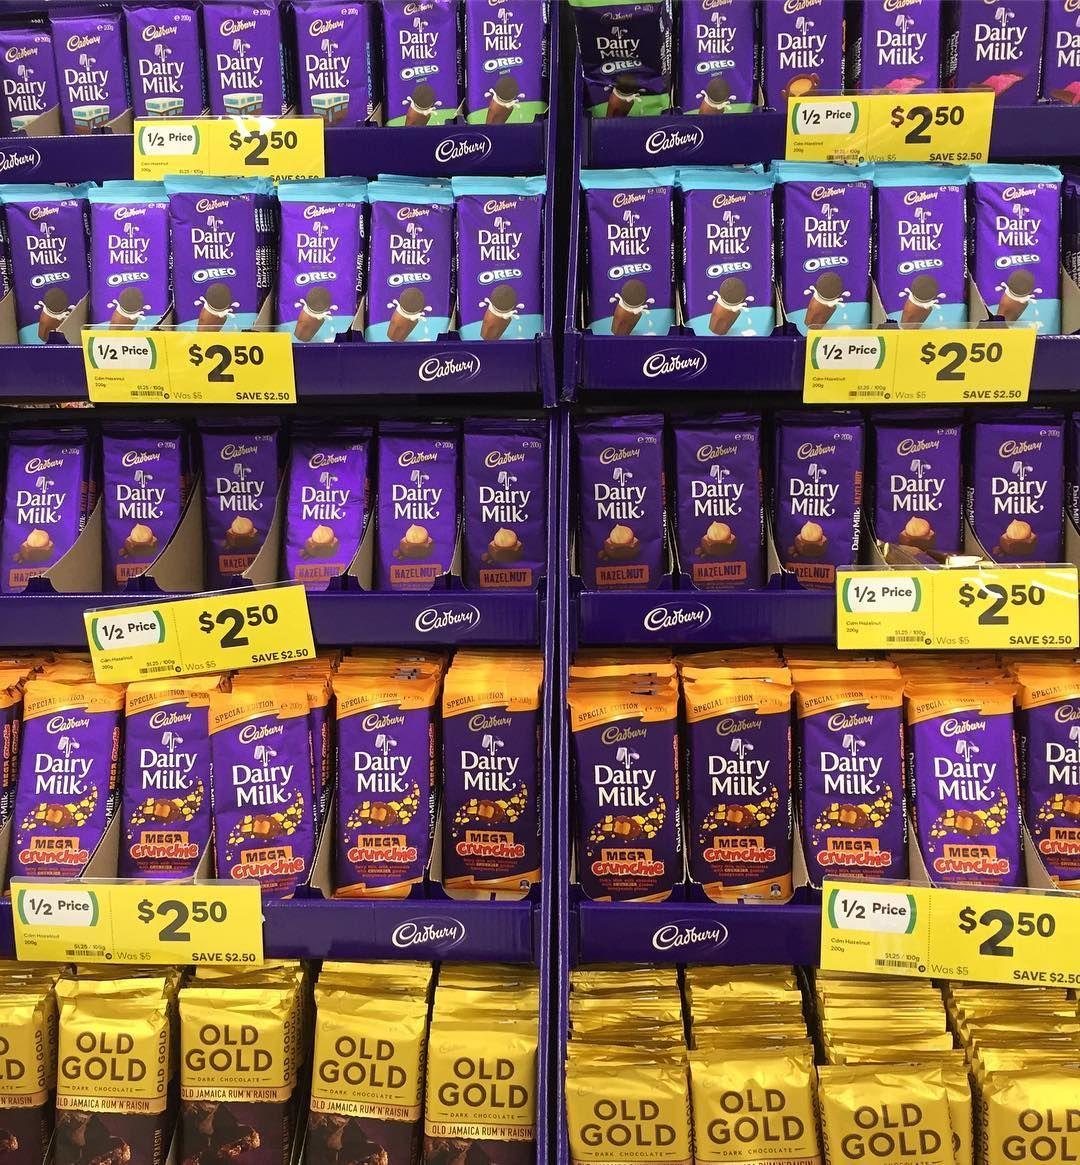 Cadbury Dairymilk Oldgold Chocolate Blocks Are Halfprice At Woolworths Mmmm Hazelnut Dairy Milk Chocolate I Love Chocolate Chocolate Milk